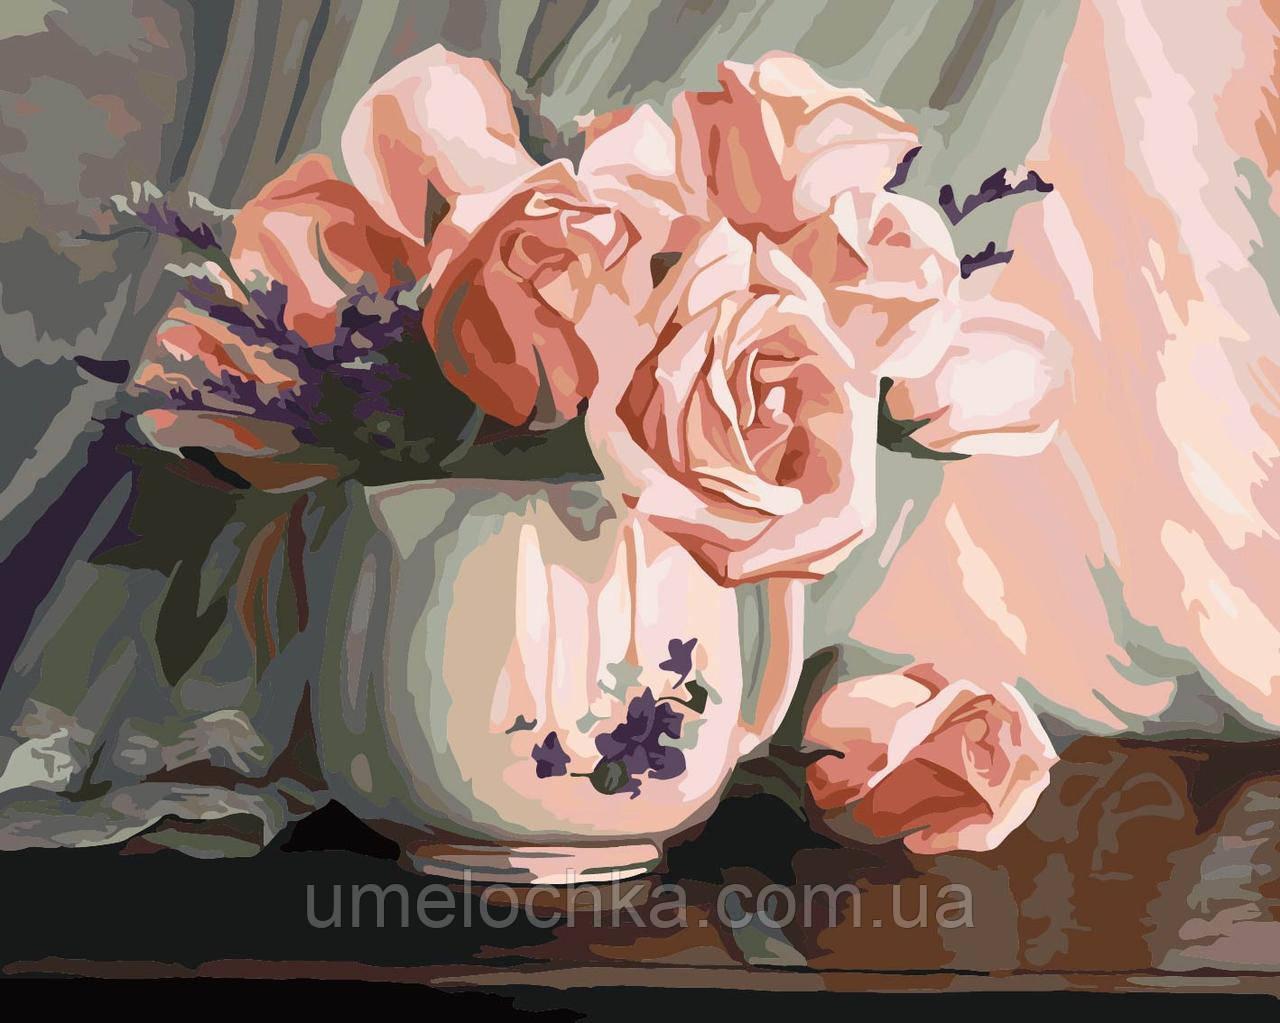 Картина по номерам Идейка Розовая романтика Худ Люси Биладо (KH2042) 40 х 50 см